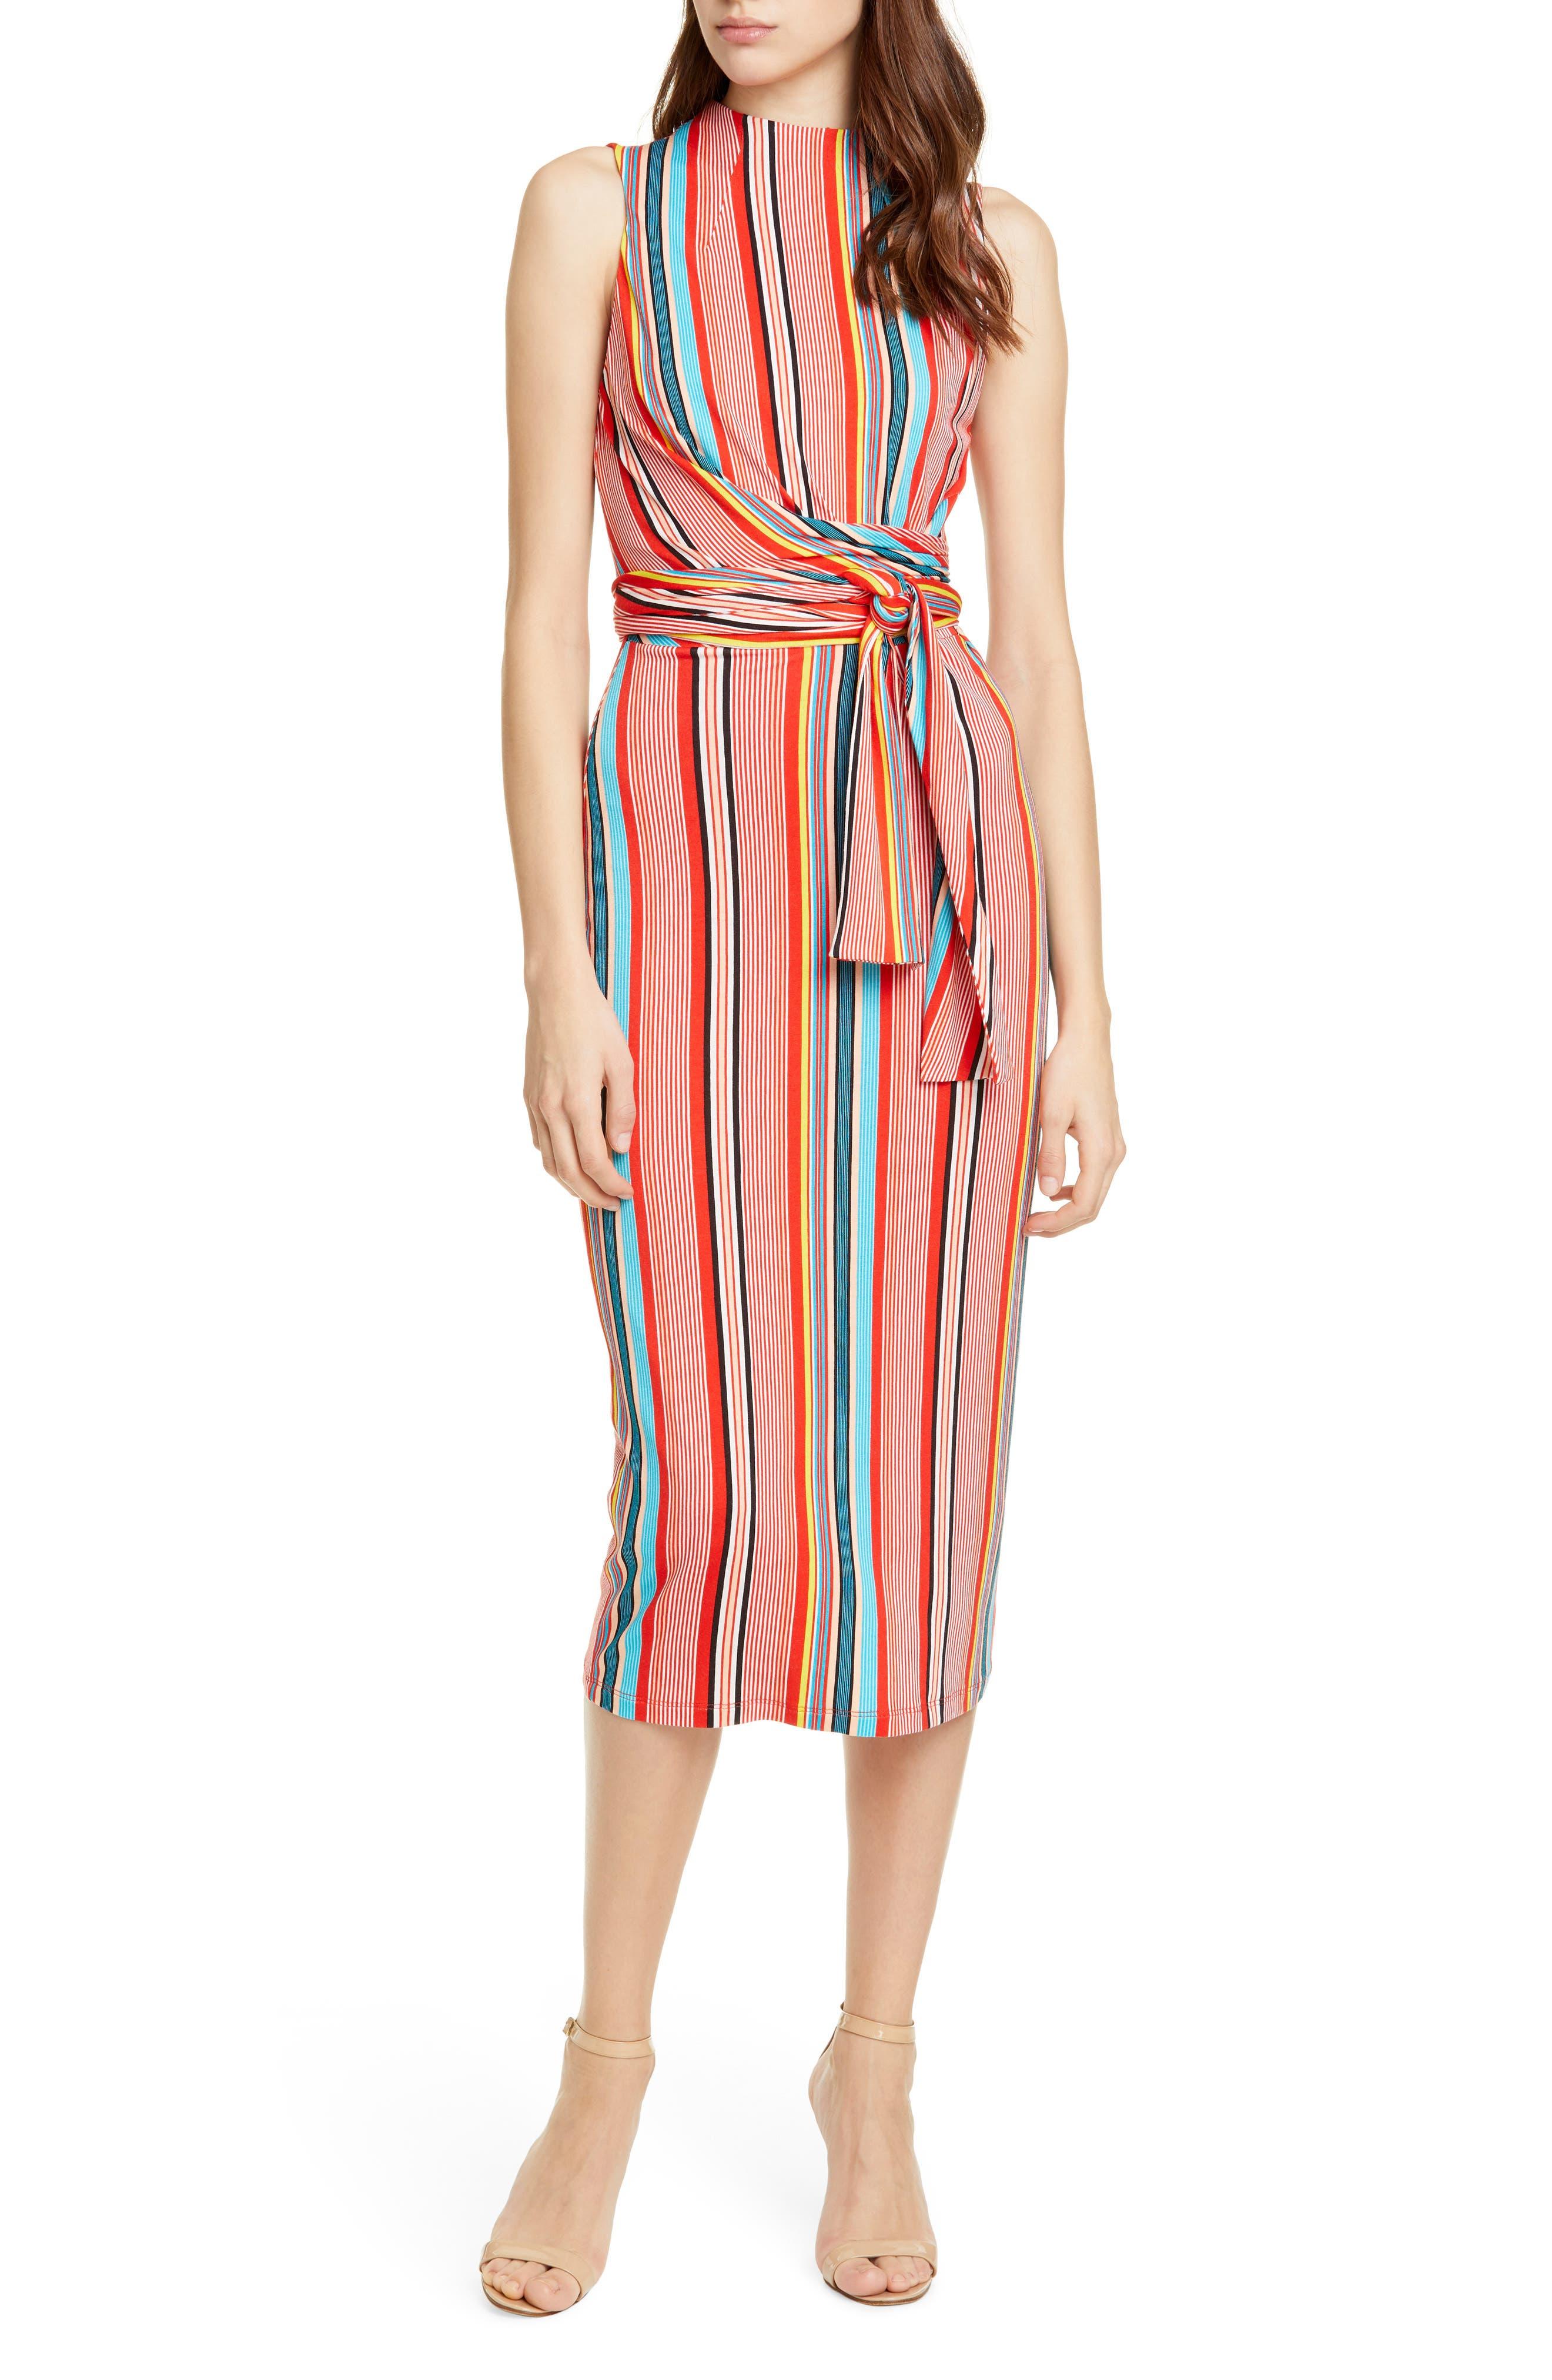 Alice + Olivia Delora Stripe Tie Waist Dress, Coral